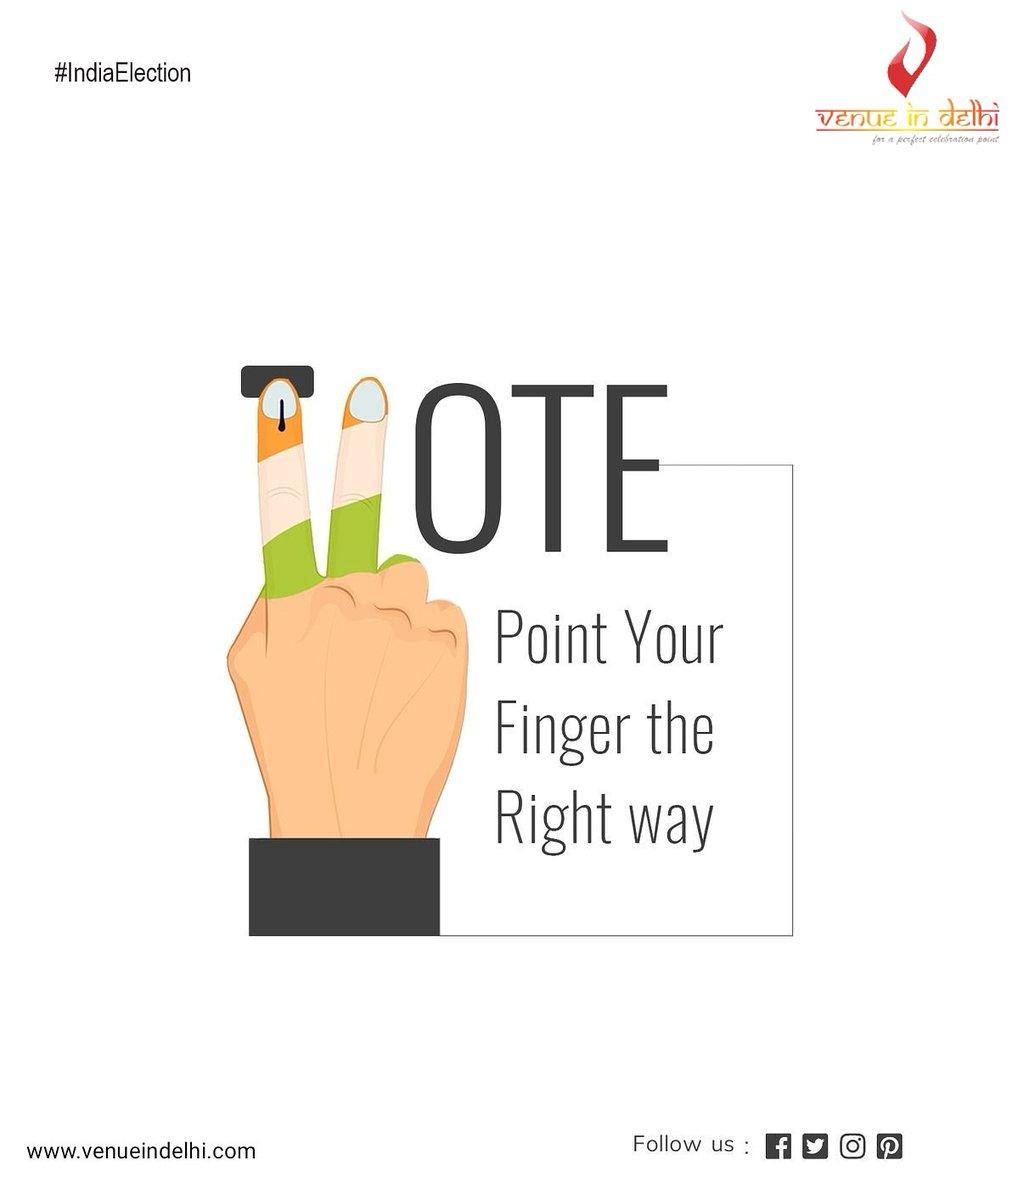 VOTE FOR CHANGE . . @prilaga #2020election #pixelection #electionday2018 #election2012 #elections #electioncommission #elections2018 #election2018 #election2019 #jokowinelection #loksabhaelections2019 #election2016 #inaelectionobserversos #electionnight #2019electionpic.twitter.com/O6HLC5MPbl